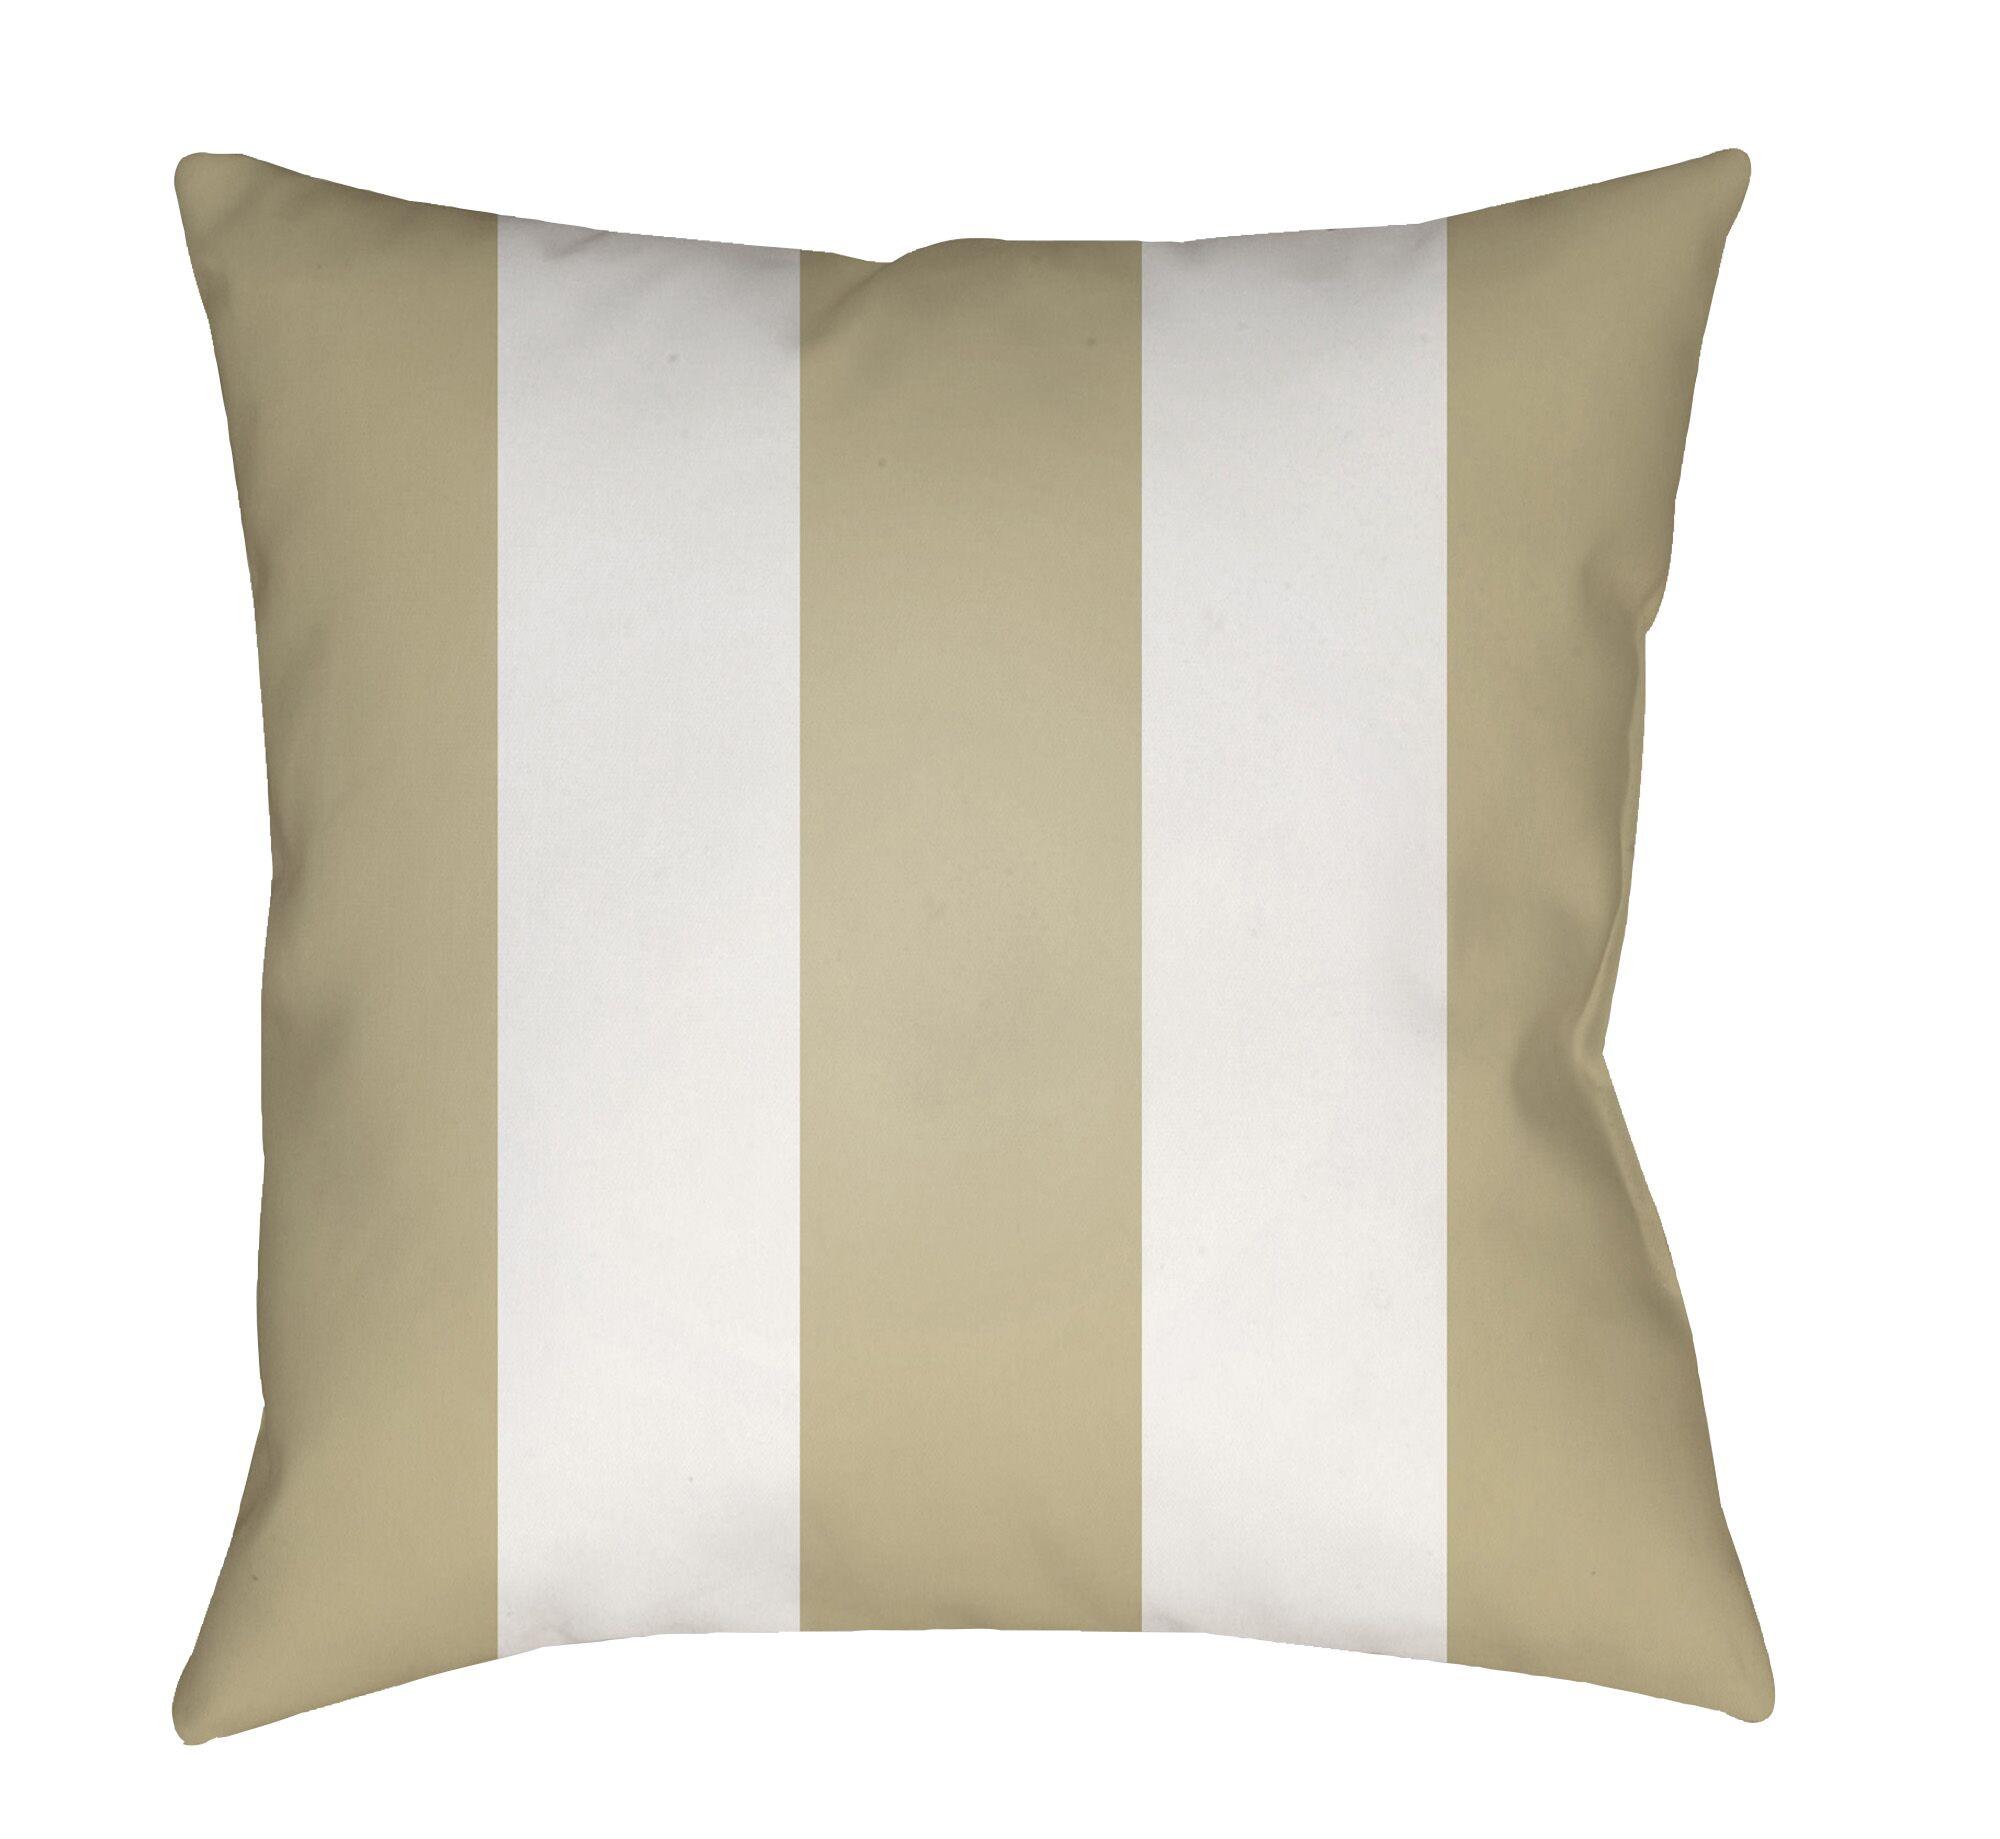 Chardae Pillow-Black & White Vertical Stripe Size: 20